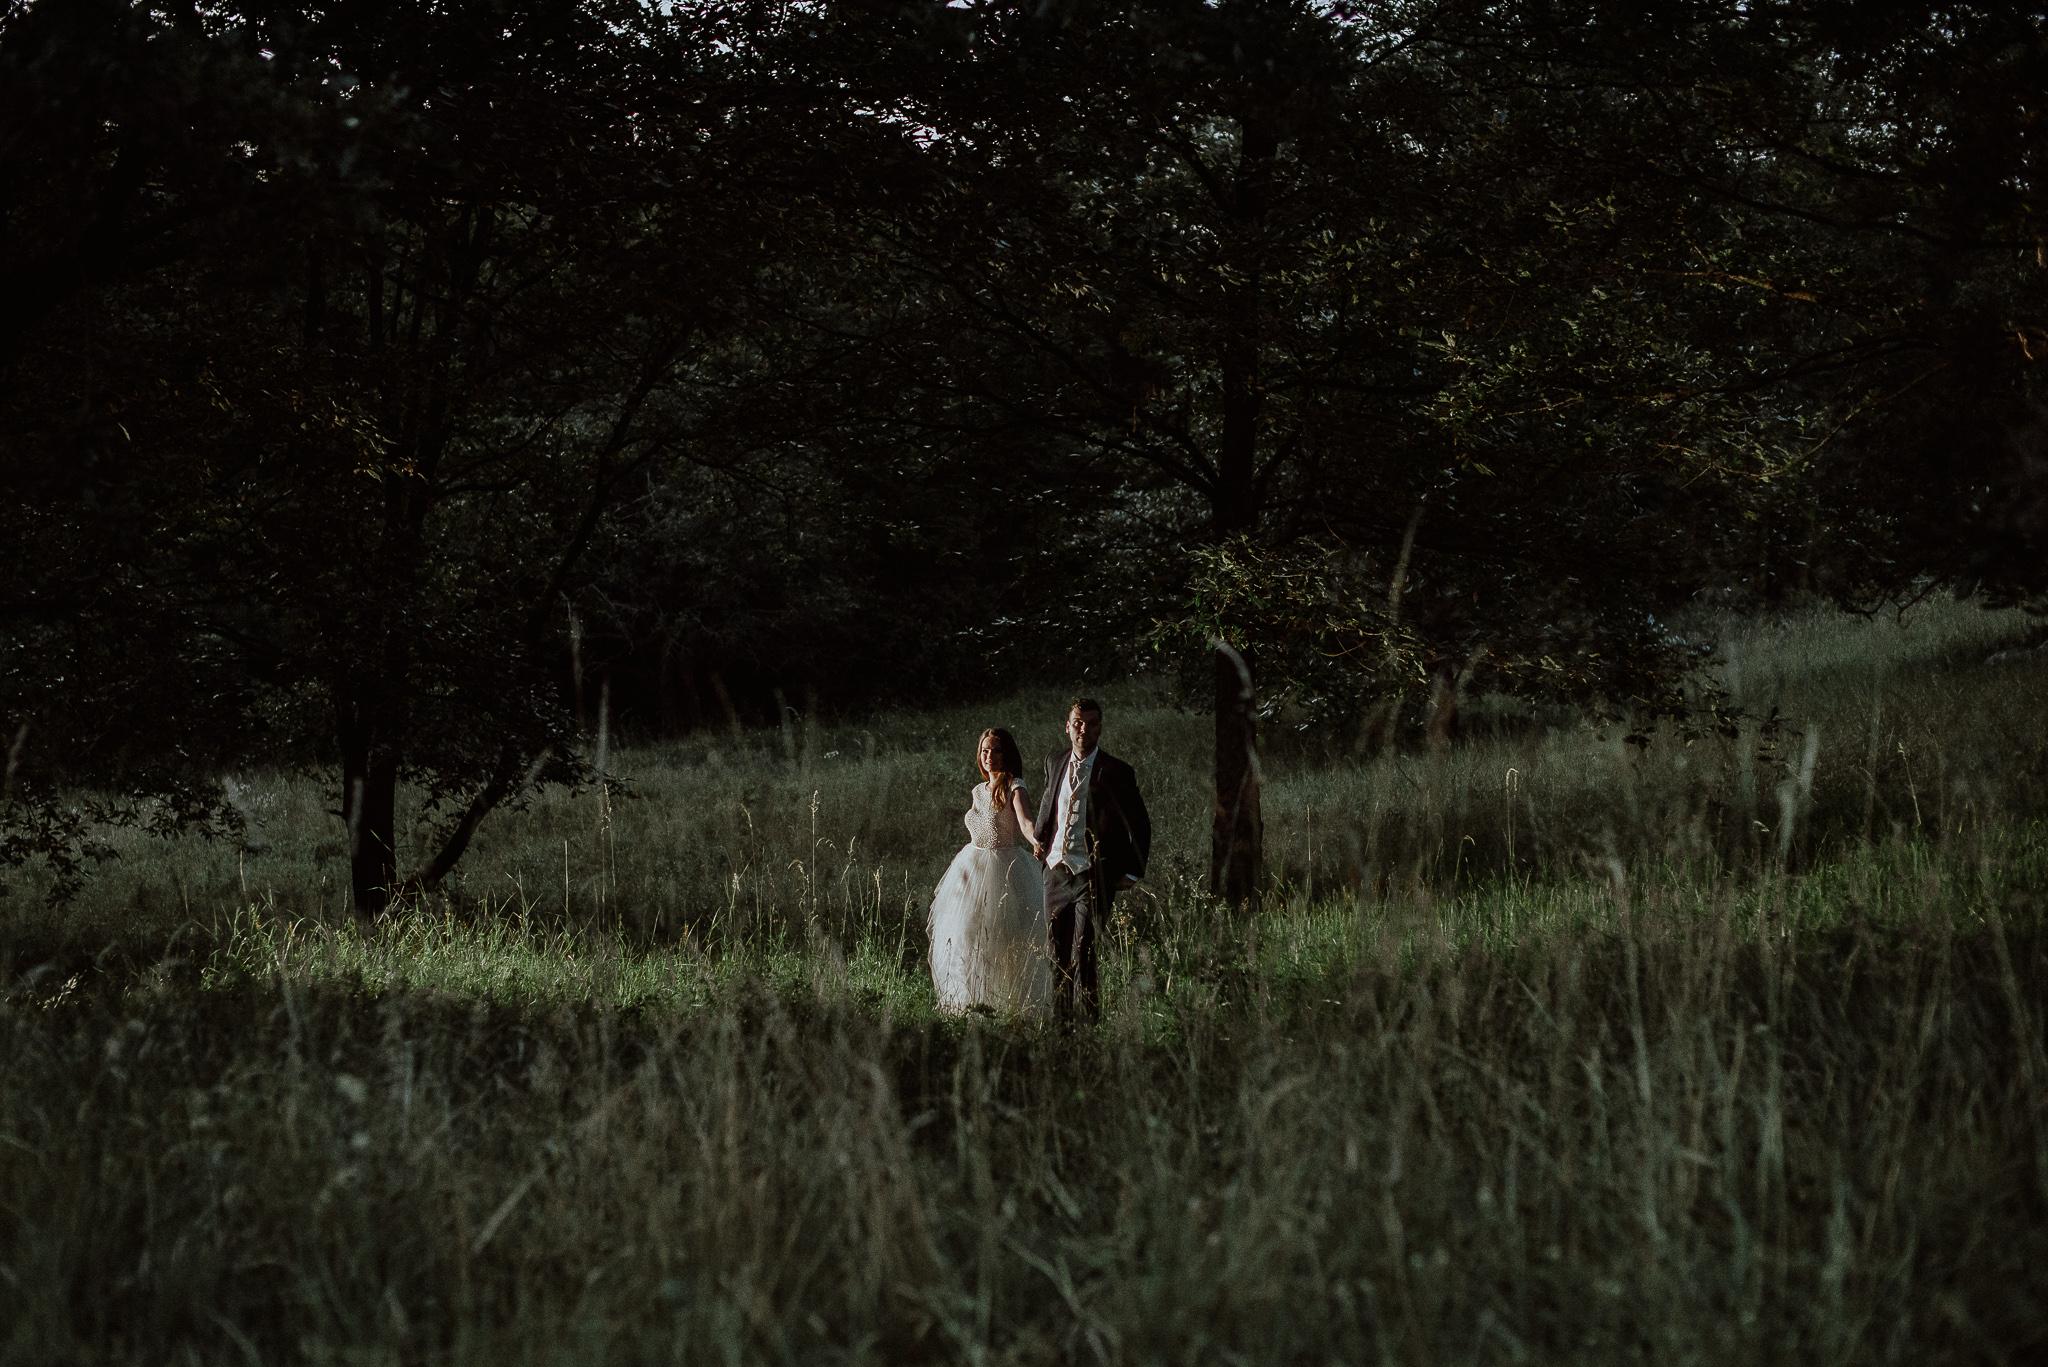 Nóri & Levi kreativ esküvő fotózás Tihany Balaton Kali medence